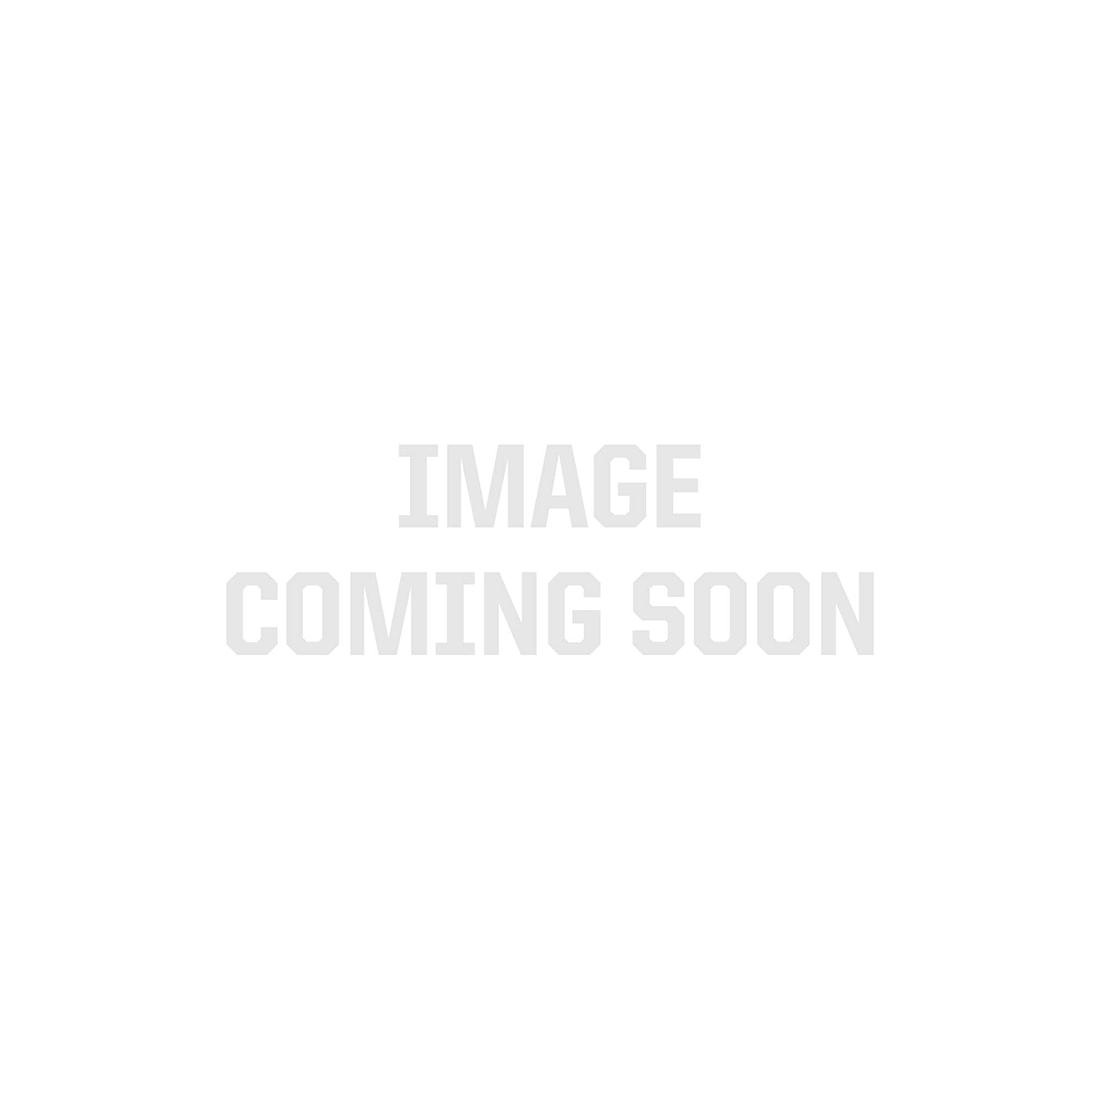 TruColor 2835 LED Strip Light - 3,000K - 160/m - CurrentControl - Sample Kit